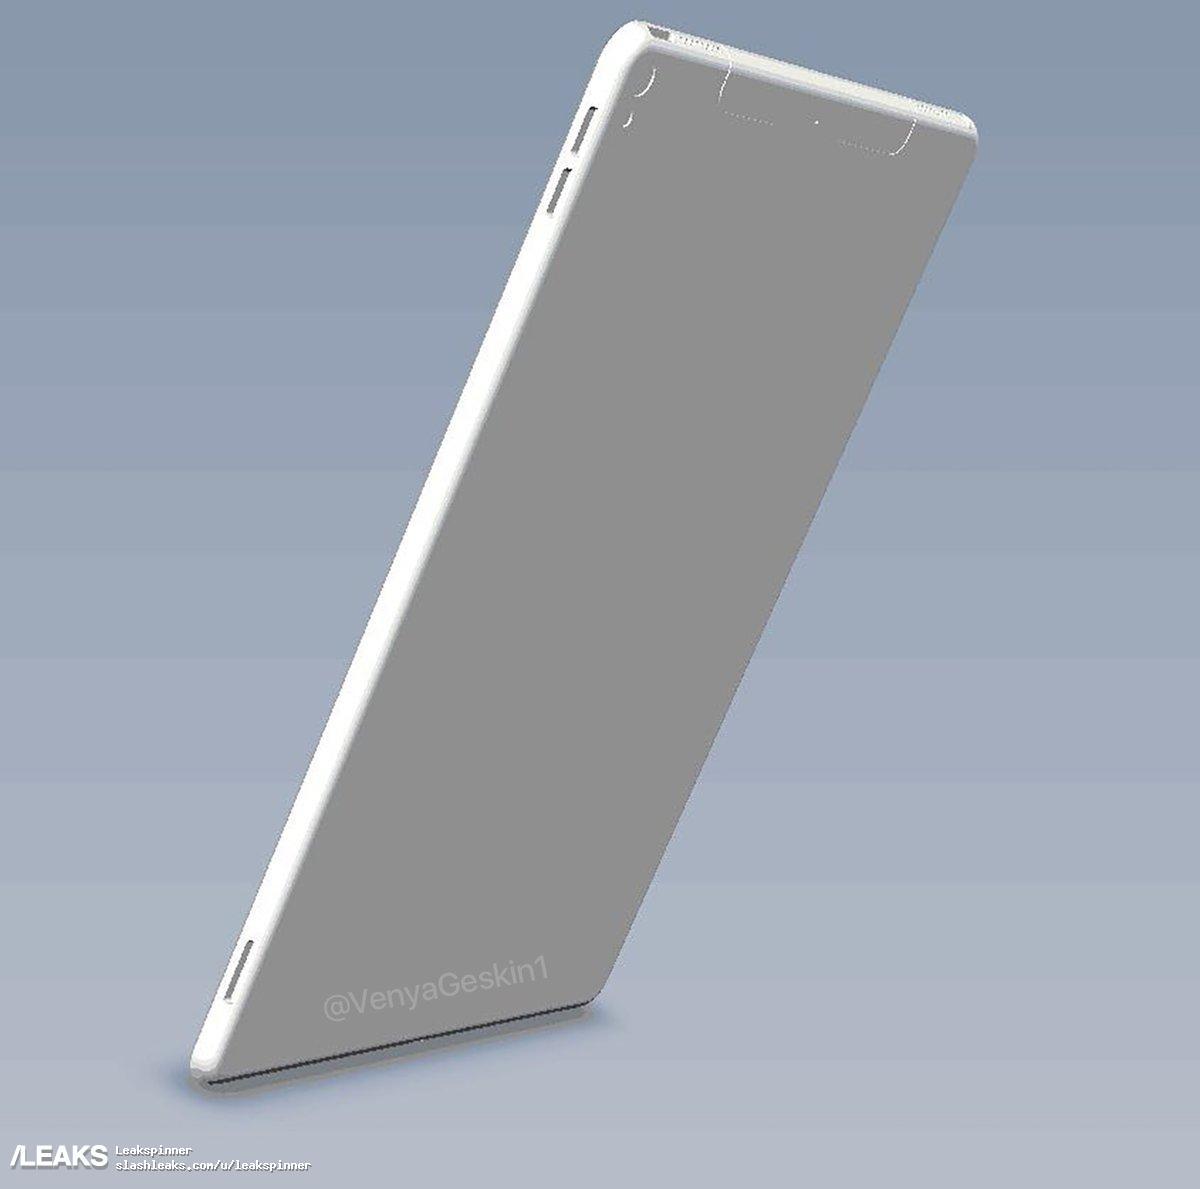 img 10.5-inch iPad Pro CAD and dummy leaked